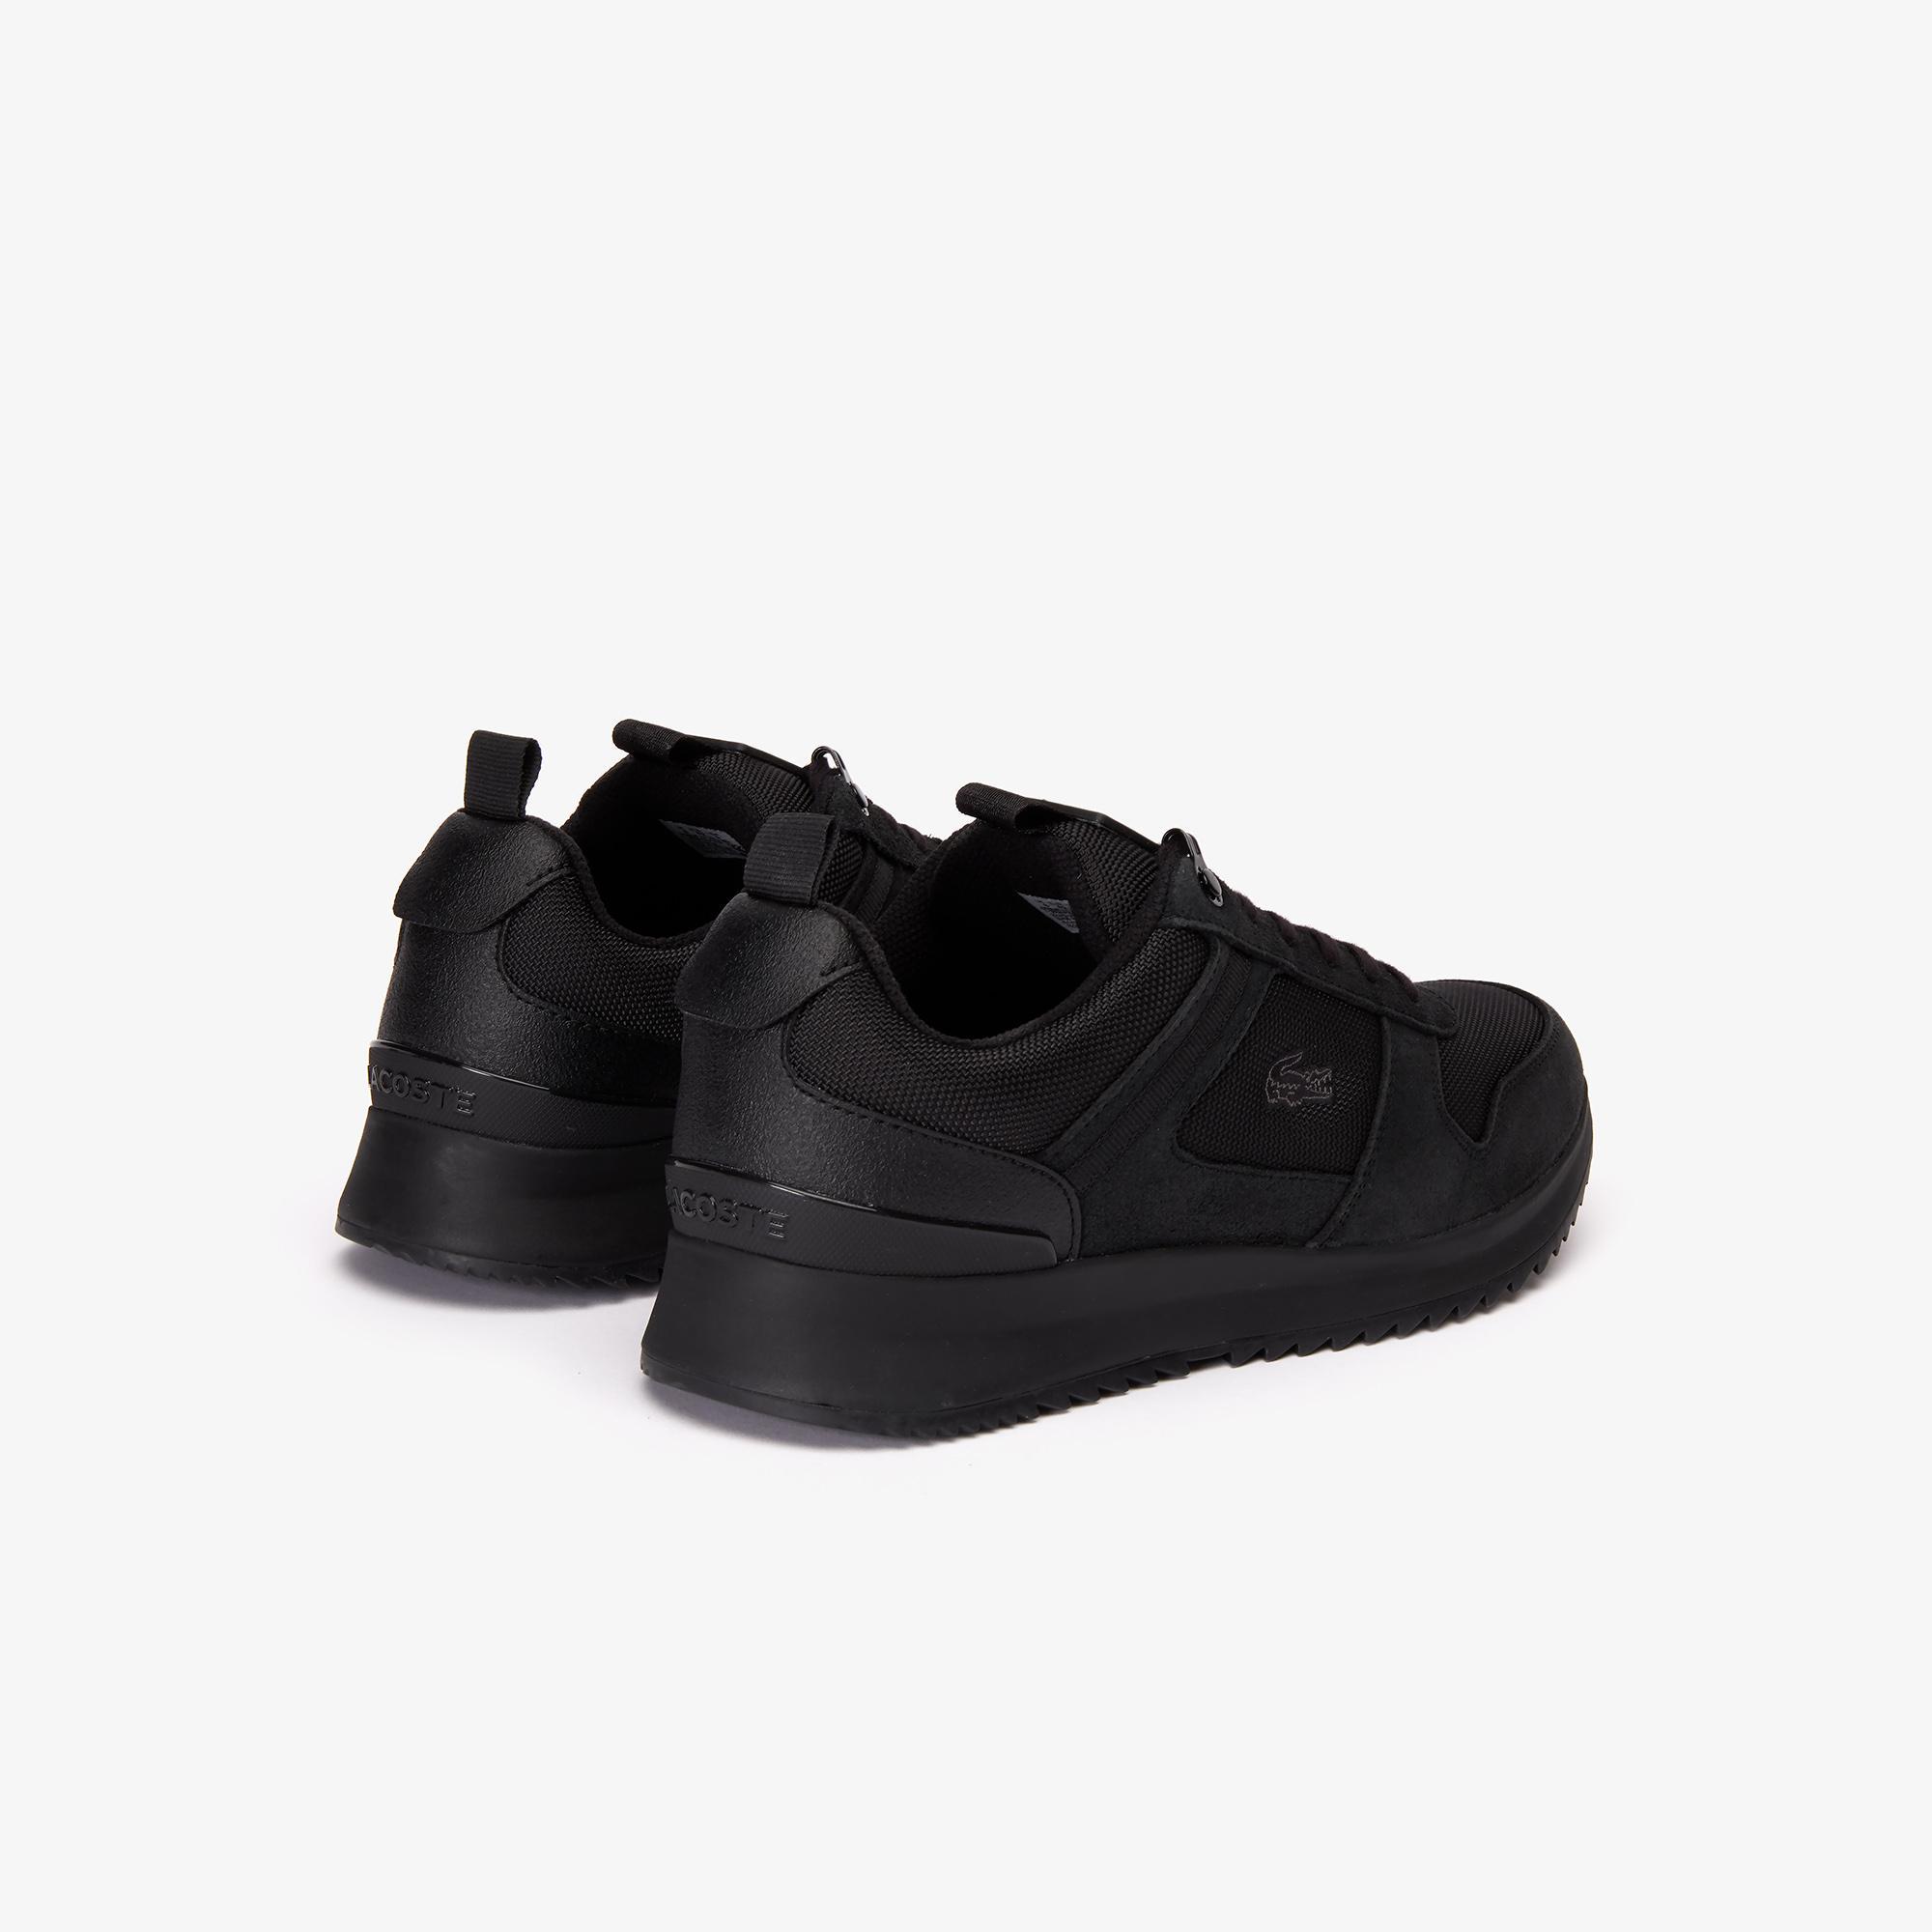 Lacoste Men's Joggeur 2.0 319 3 SMA Sneakers